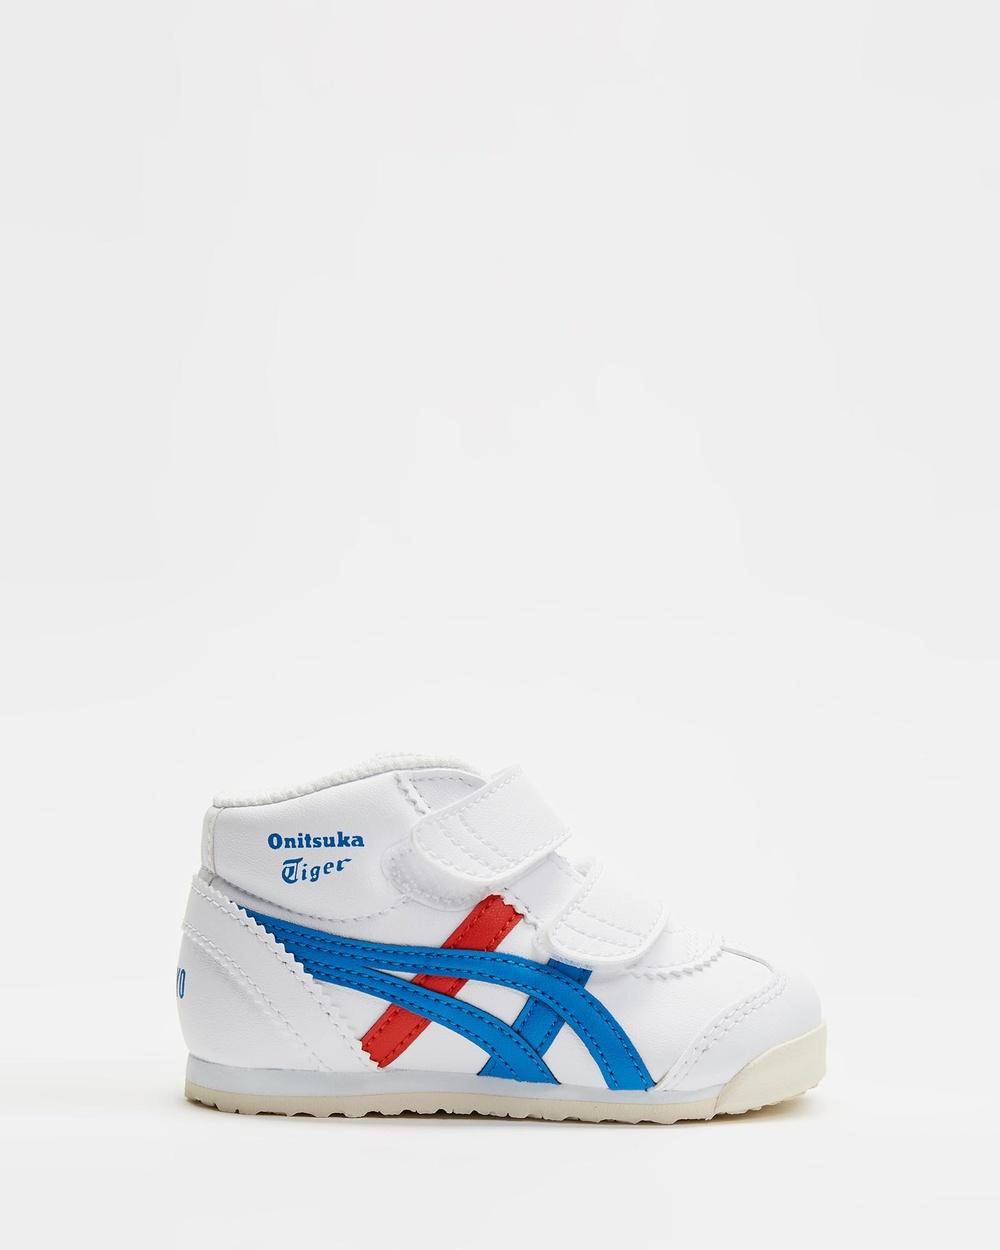 Onitsuka Tiger Mexico Mid Runner TS Kid's Sneakers White / Directoire Blue Mid-Runner Australia